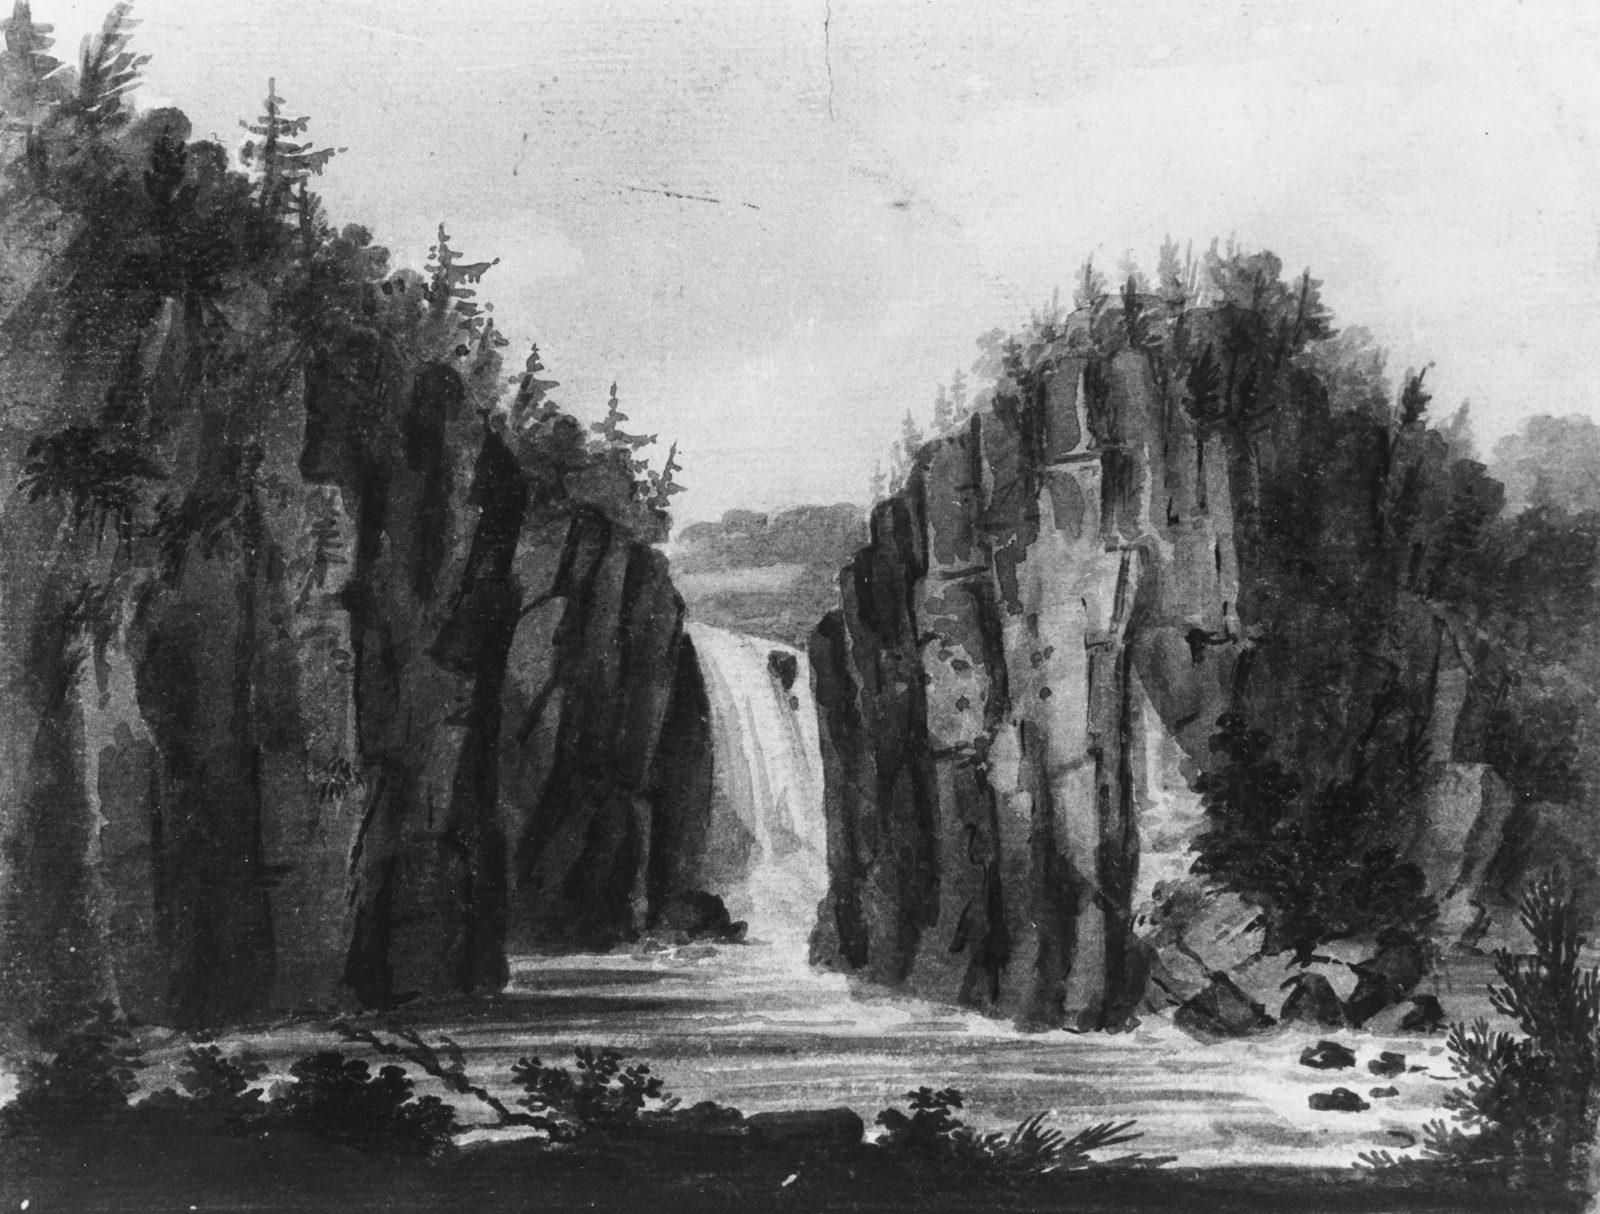 Passaic Falls, New Jersey (?)